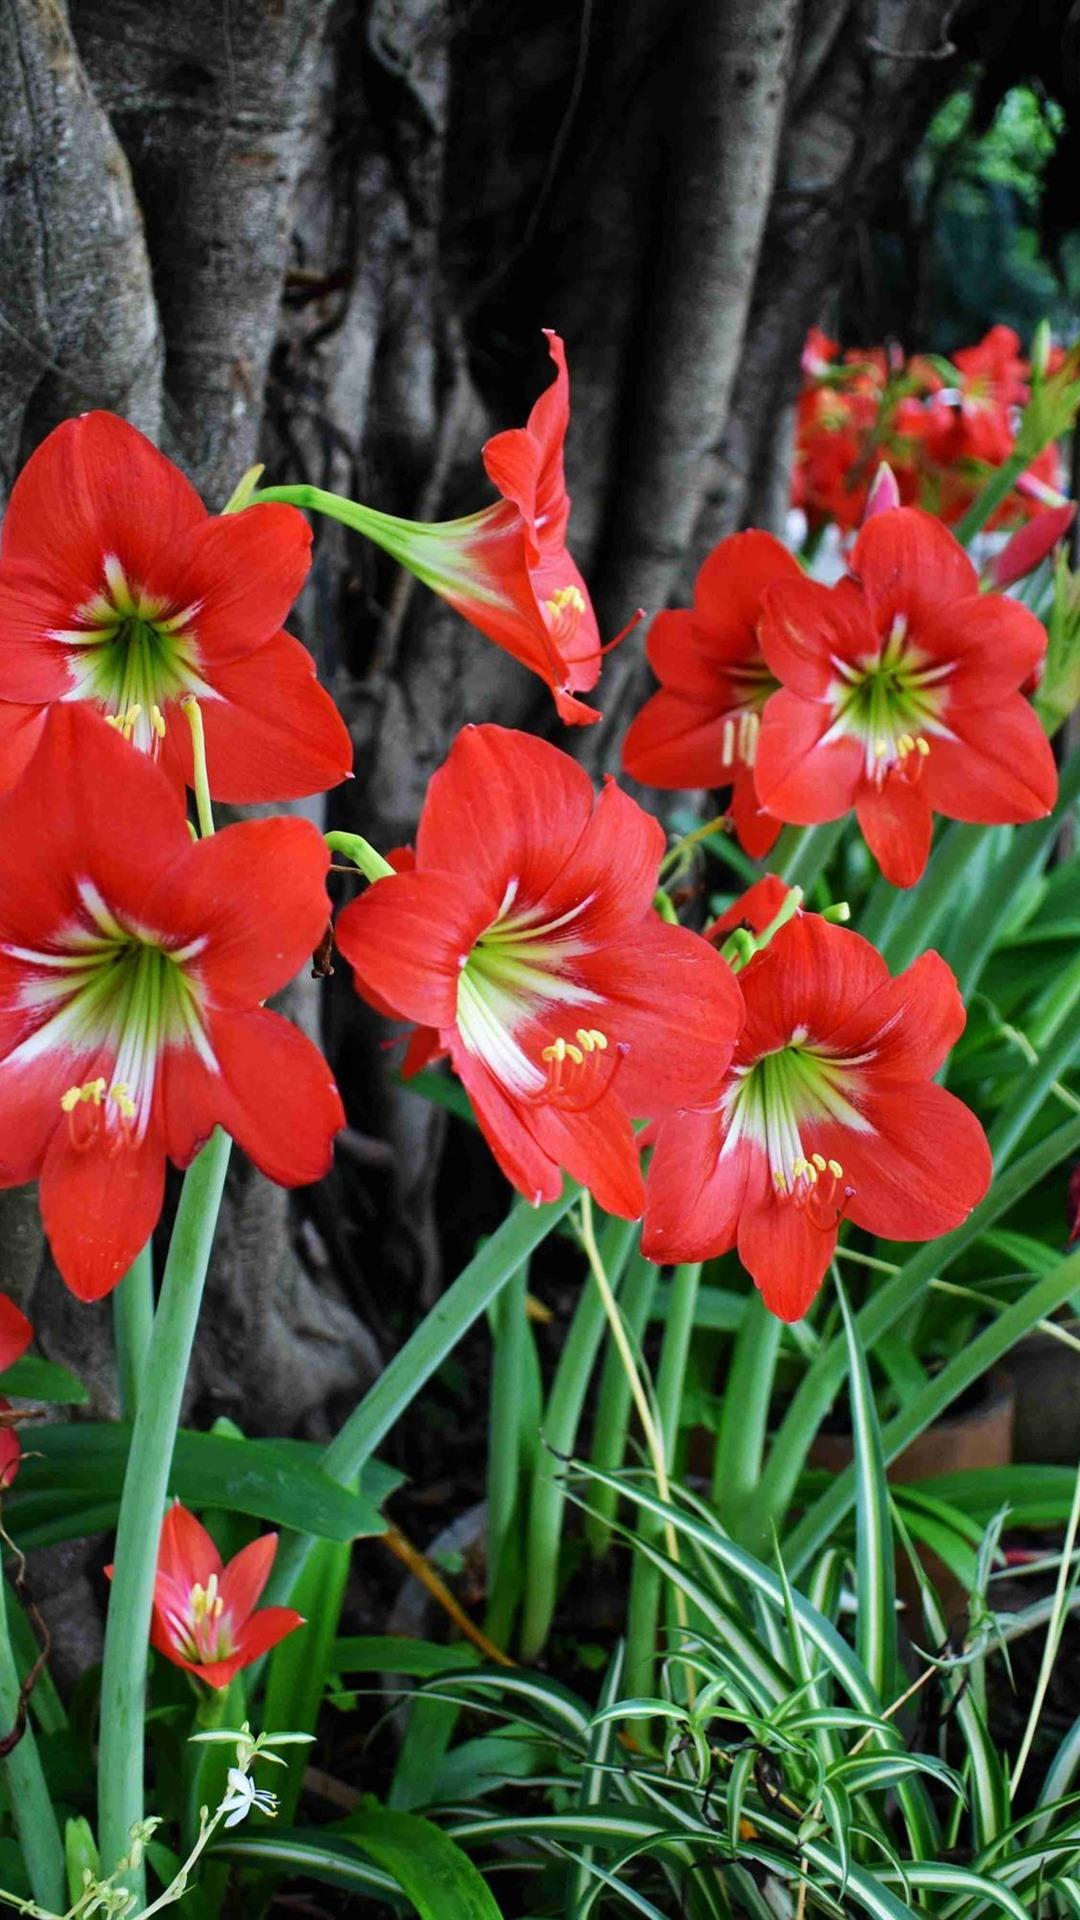 Rote Orchidee Blumen 1080x1920 Iphone 8 7 6 6s Plus